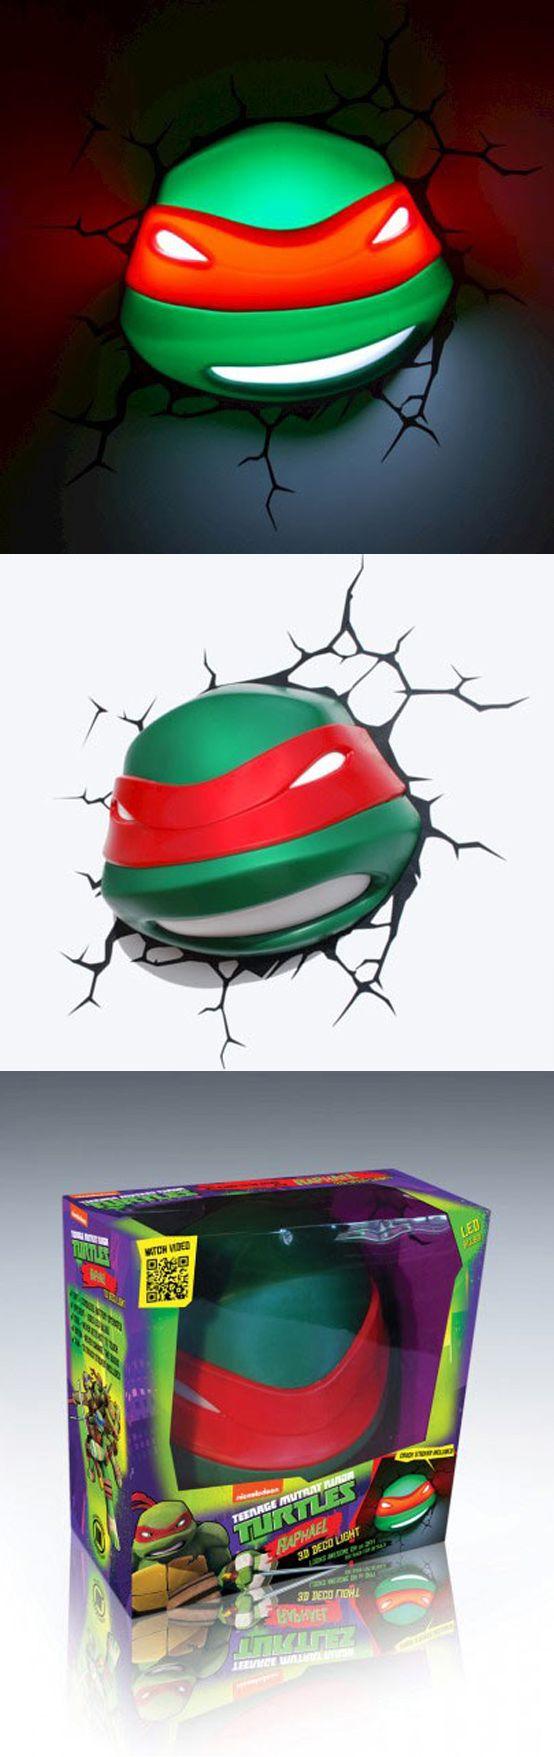 Lámpara de las Tortugas Ninja en 3D! - 3D Ninja Turtles Lamp #RegalosFrikis #Geek #Gifts #TortugasNinja